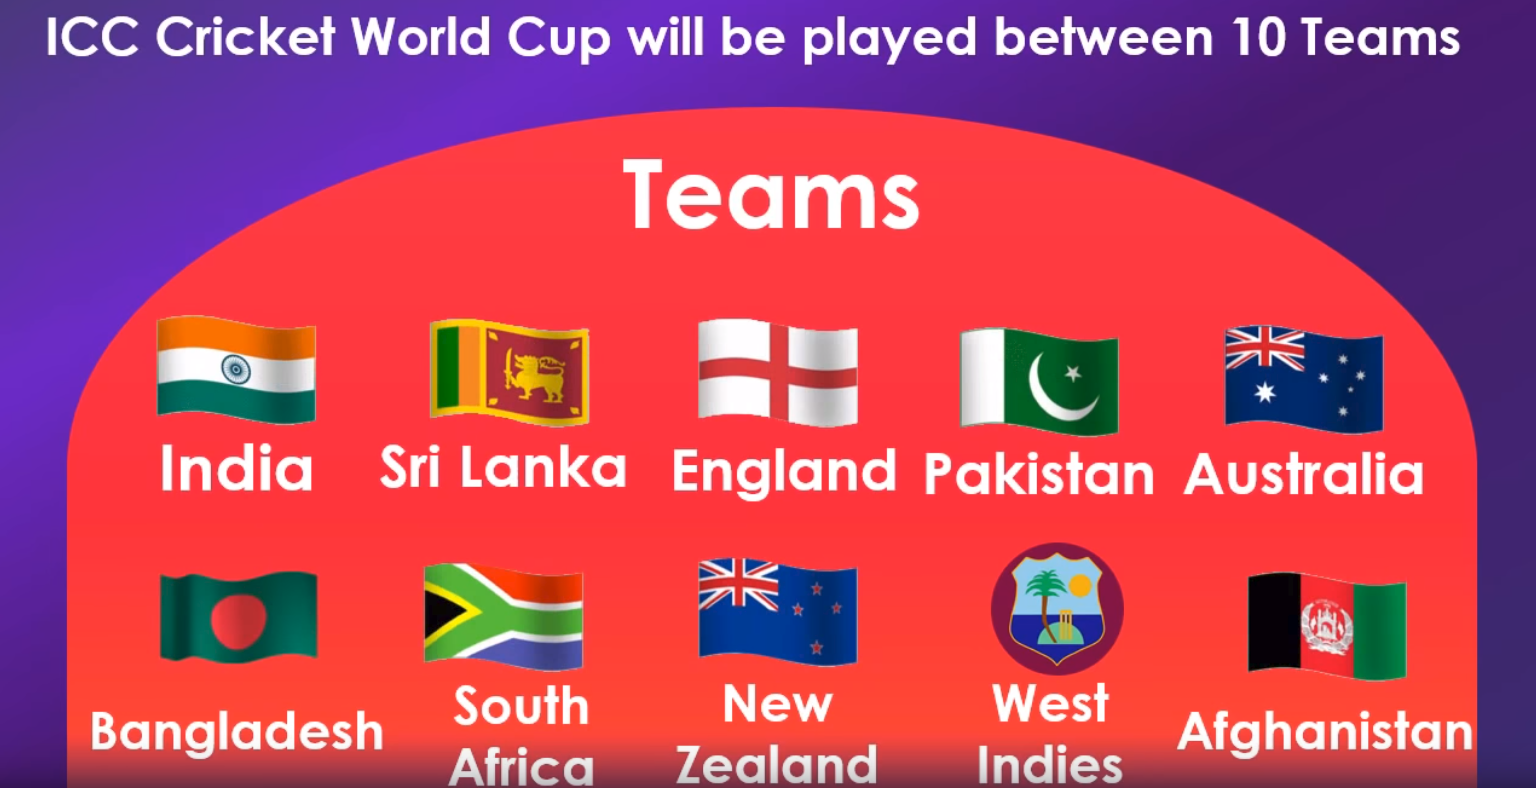 वर्ल्ड कप 2019 - ICC cricket world cup 2019 teams